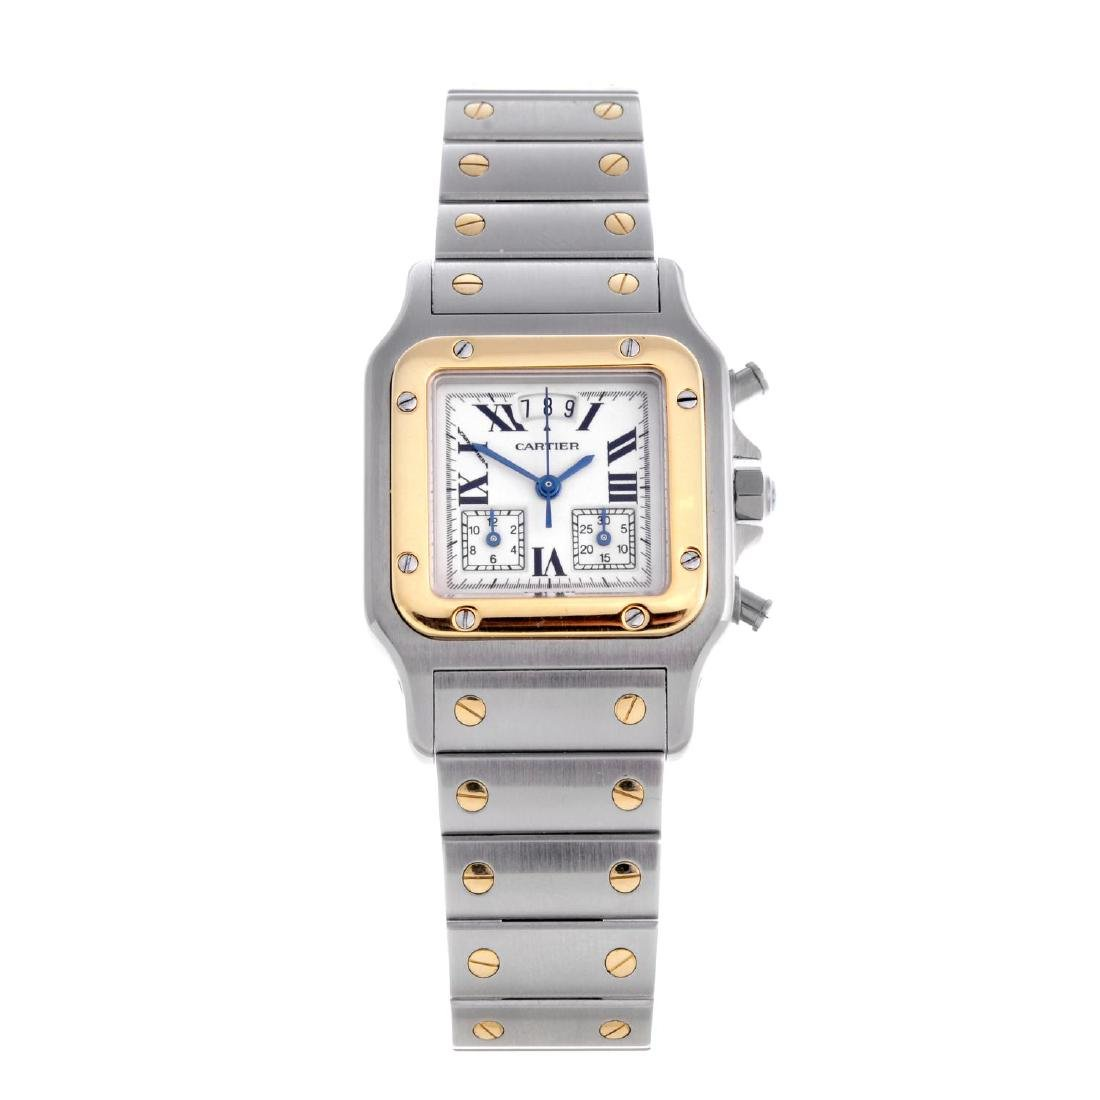 CARTIER - a Santos chronograph bracelet watch.